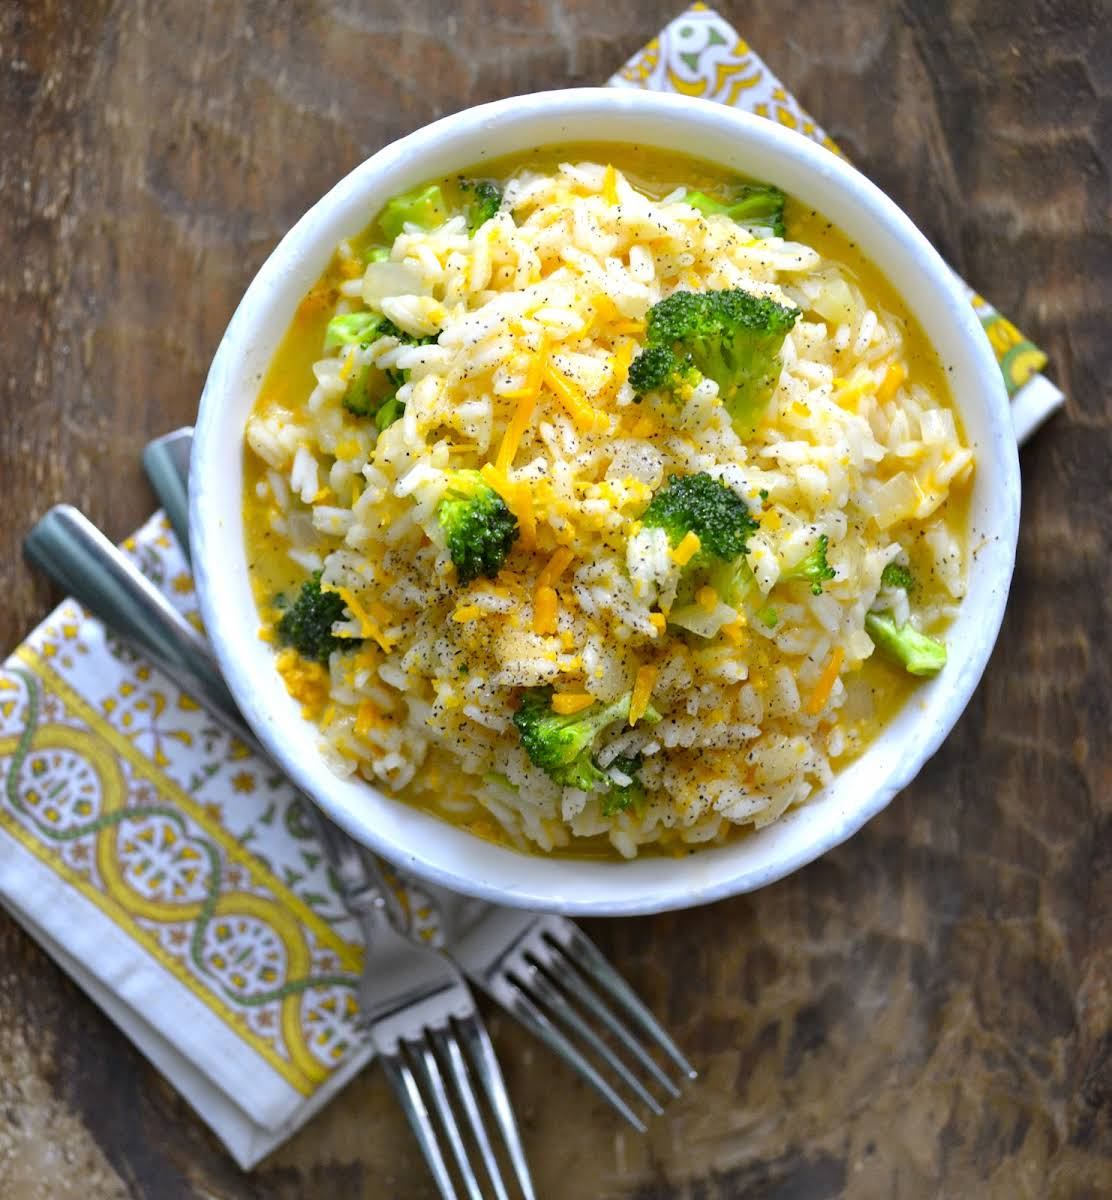 Creamy Broccoli Cheddar Rice Recipe